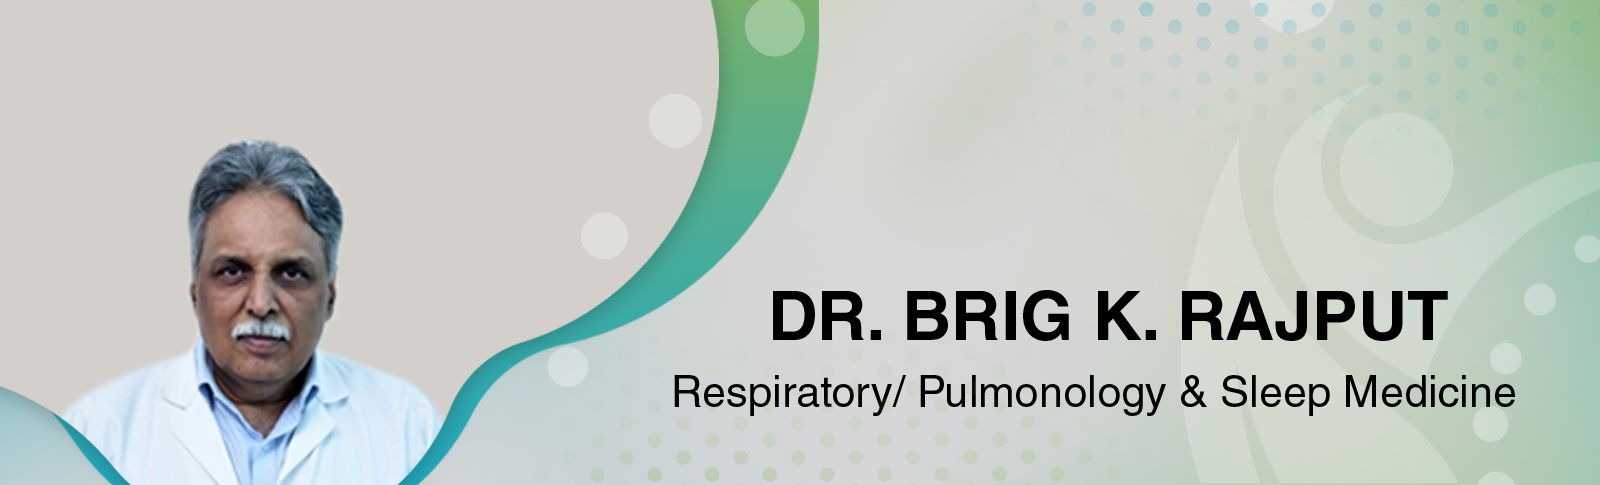 Dr. BRIG K. RAJPUT